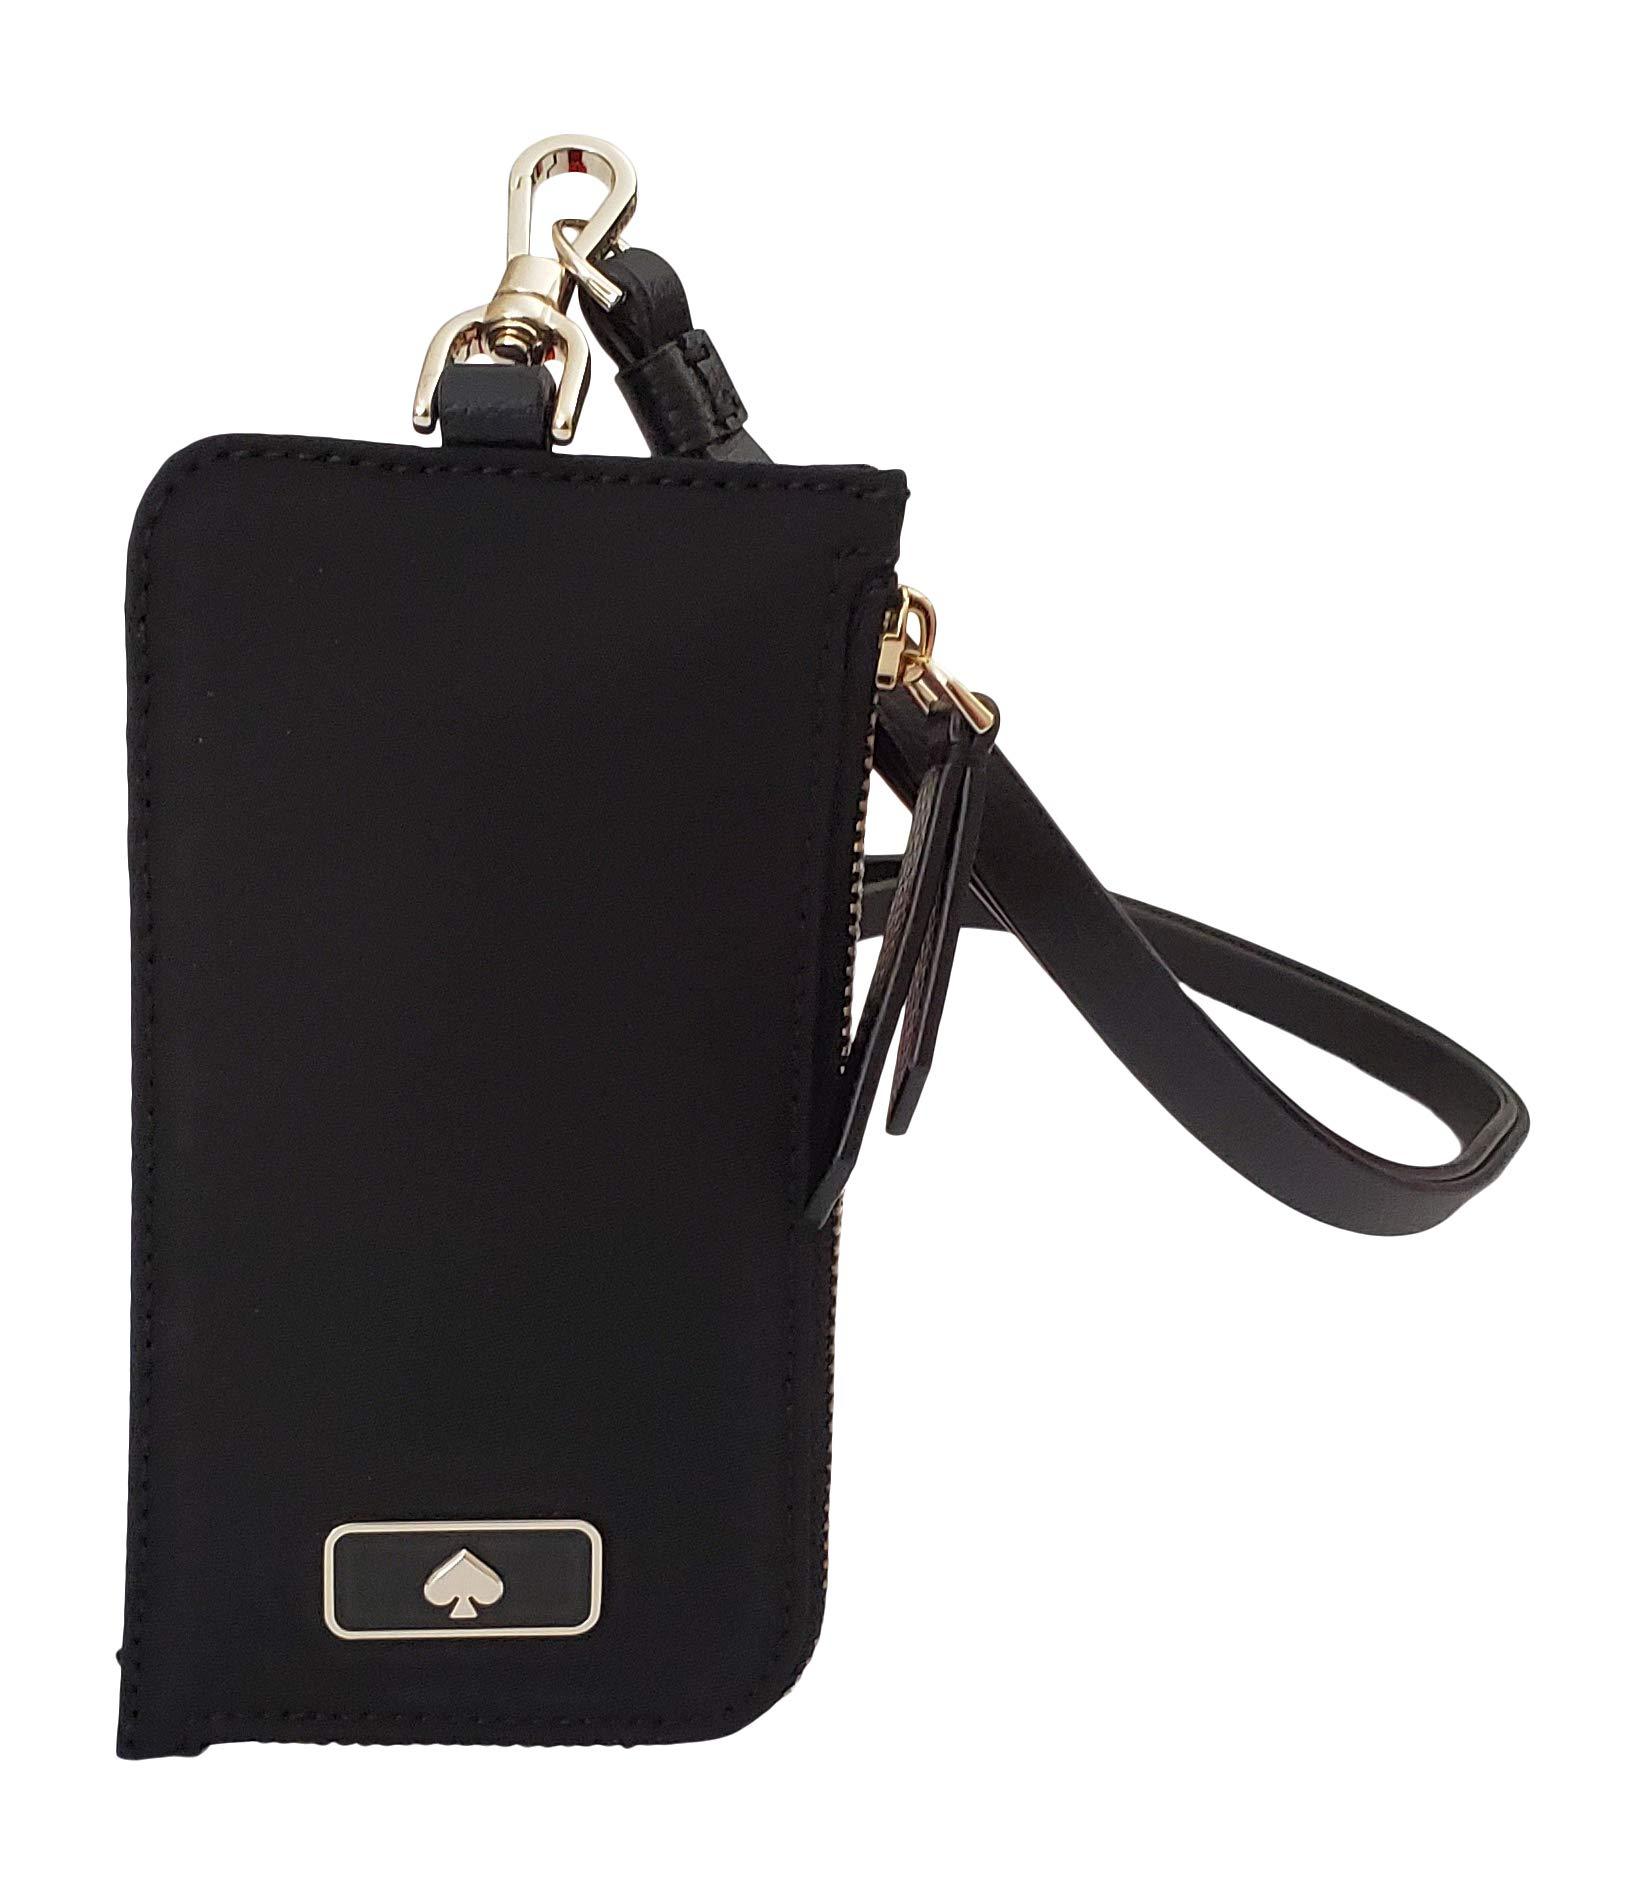 Kate Spade New York L-Zip Dawn Card Case Lanyard Black